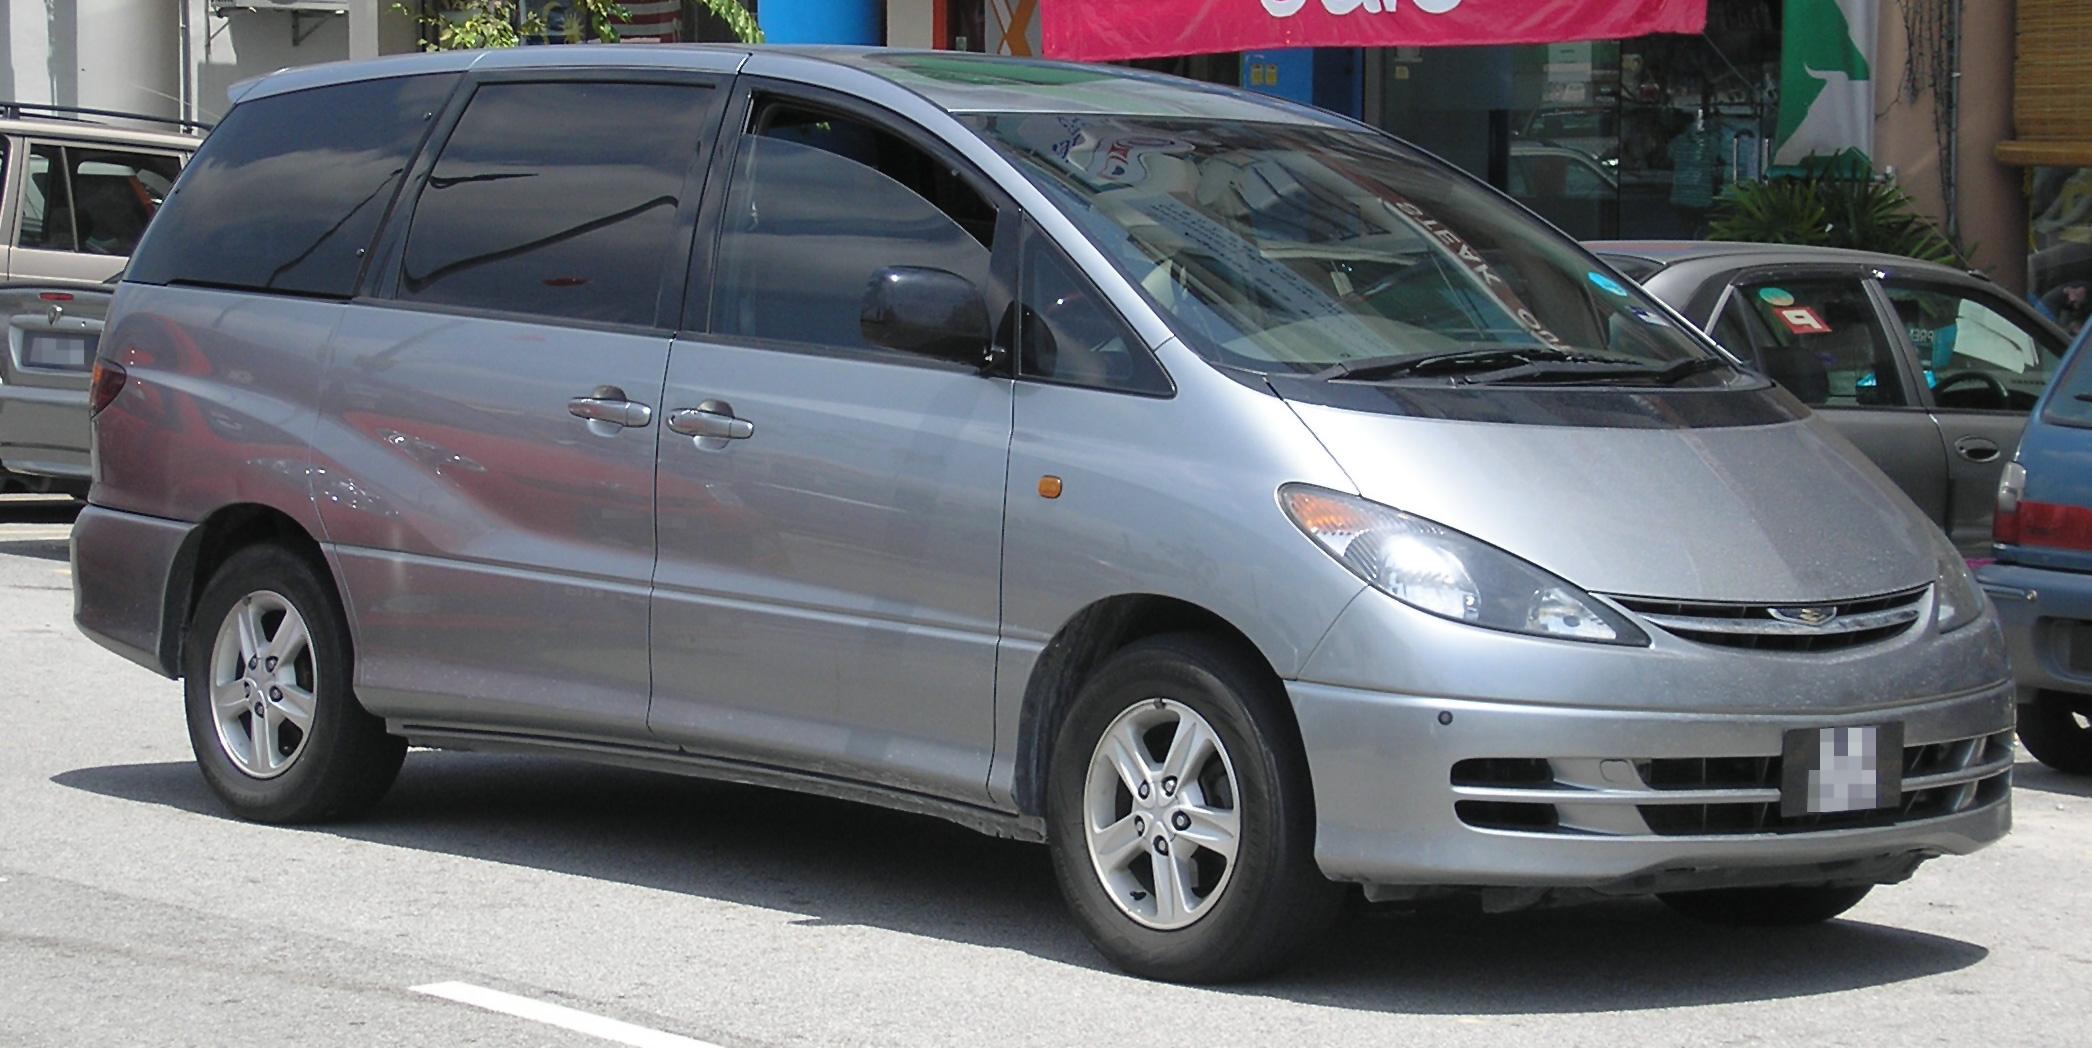 File:Toyota Estima (second generation) (front), Serdang ...